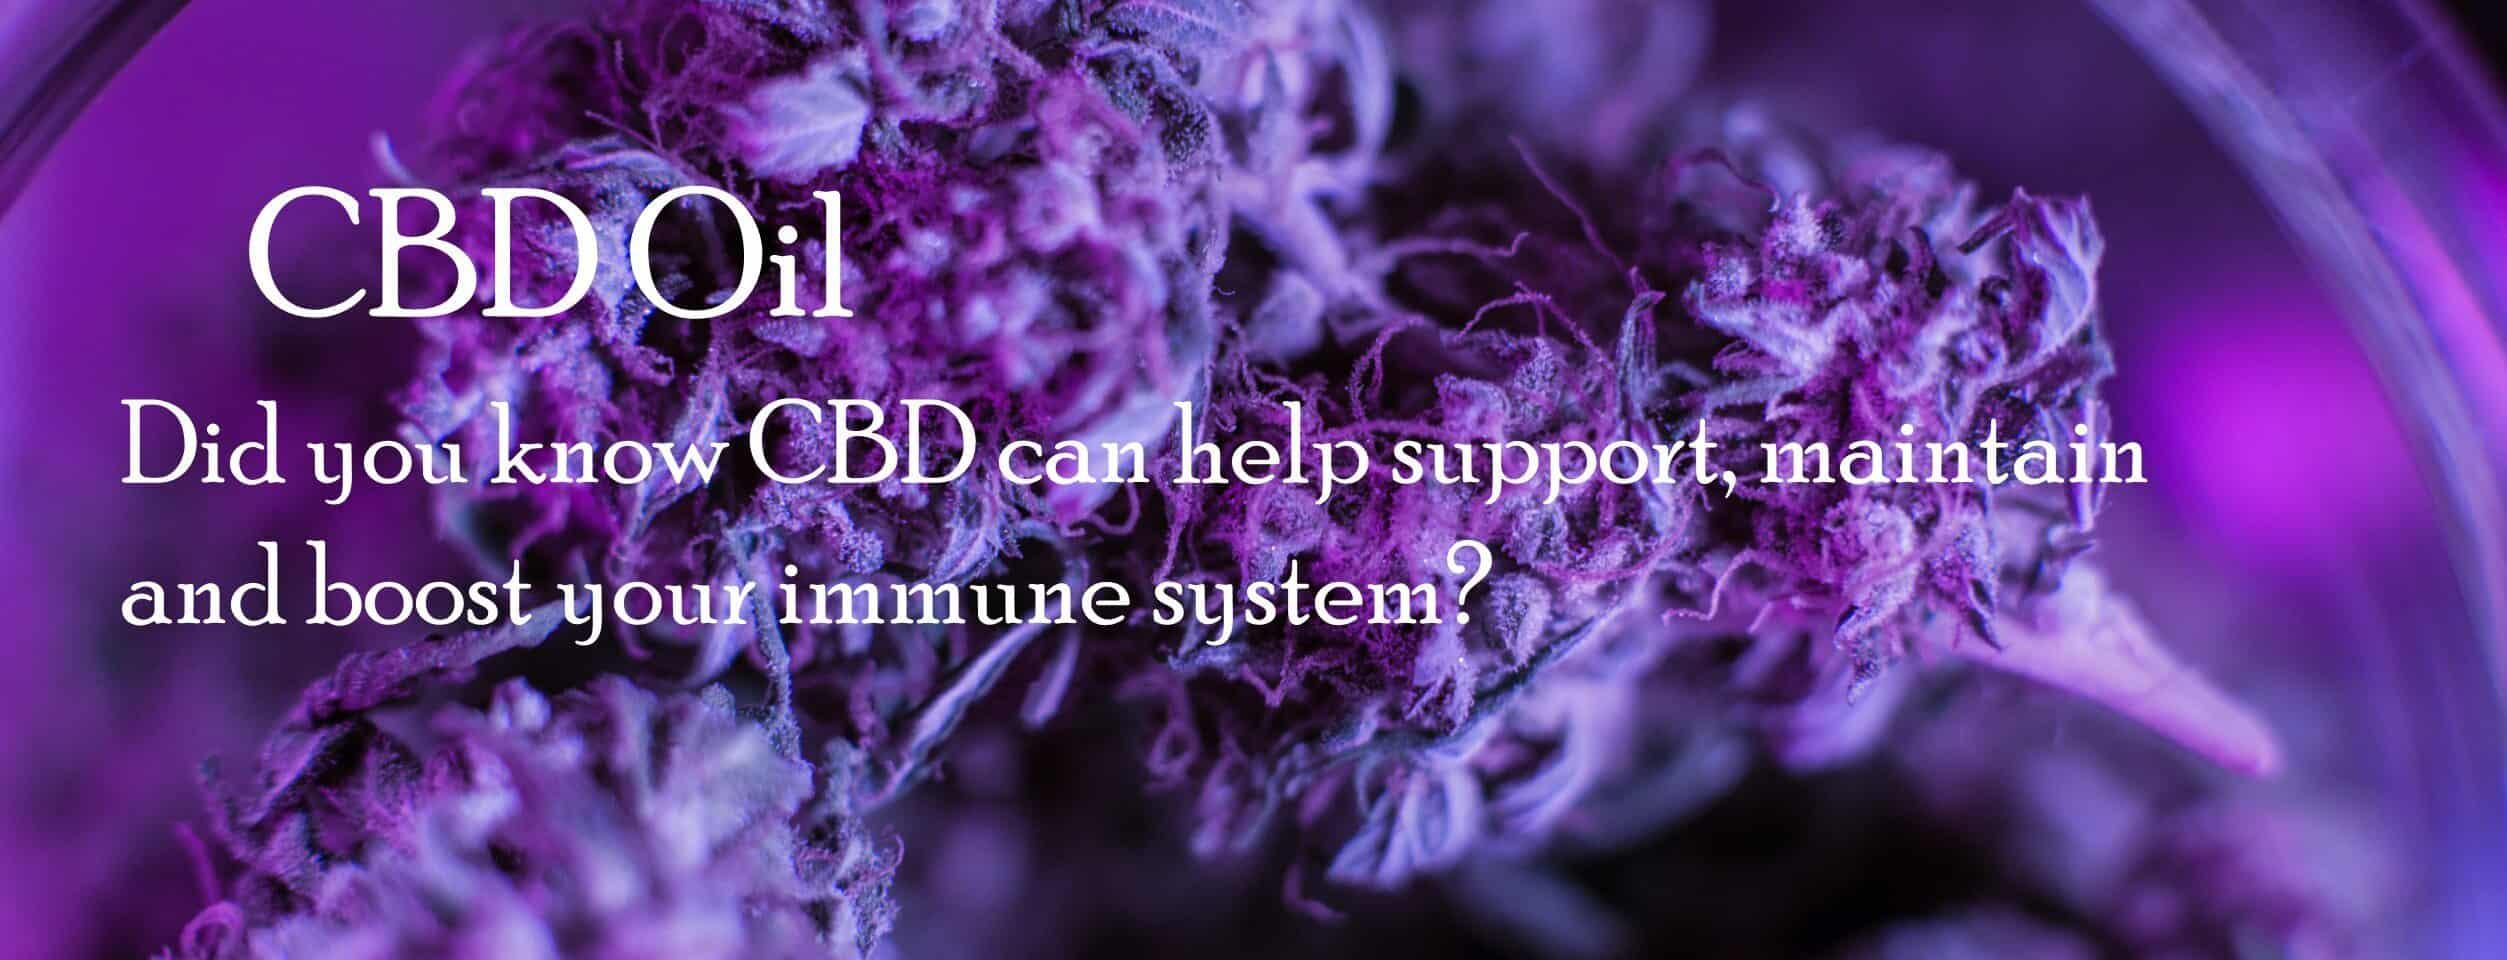 CBDLavita Coupon Code Boost Immune System